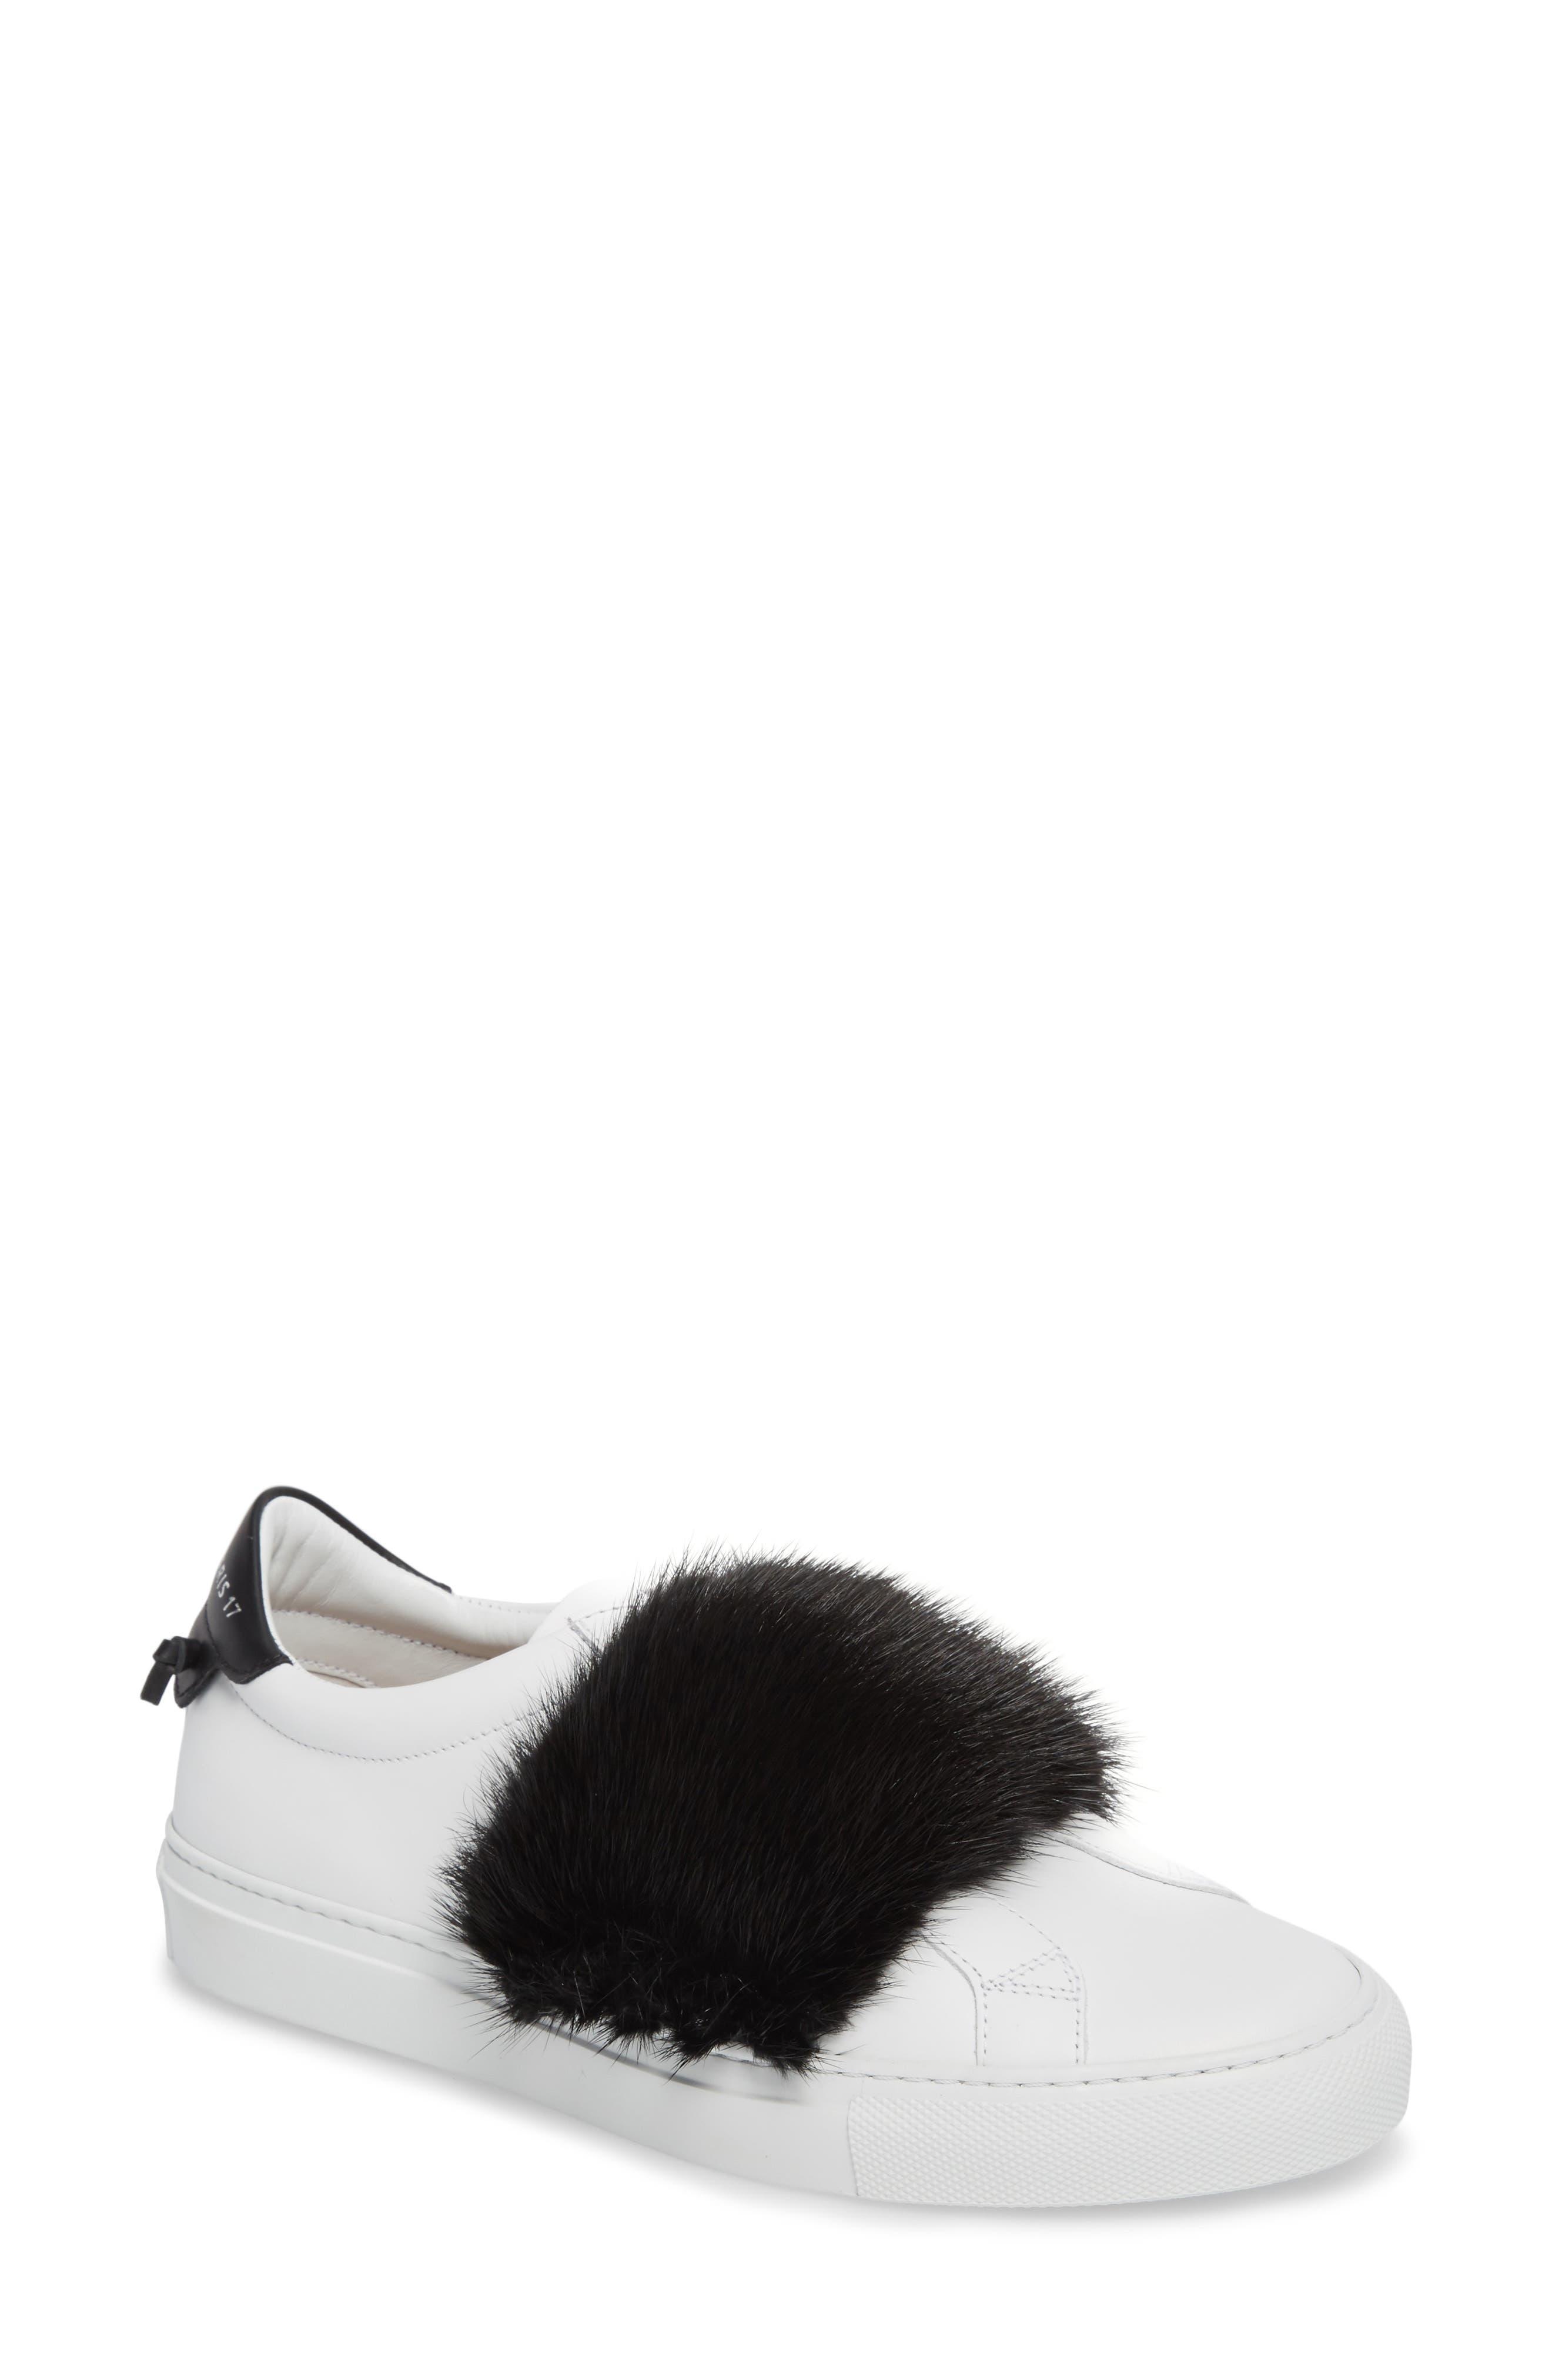 Urban Street Slip-On Sneaker with Genuine Mink Fur Trim,                         Main,                         color, 115